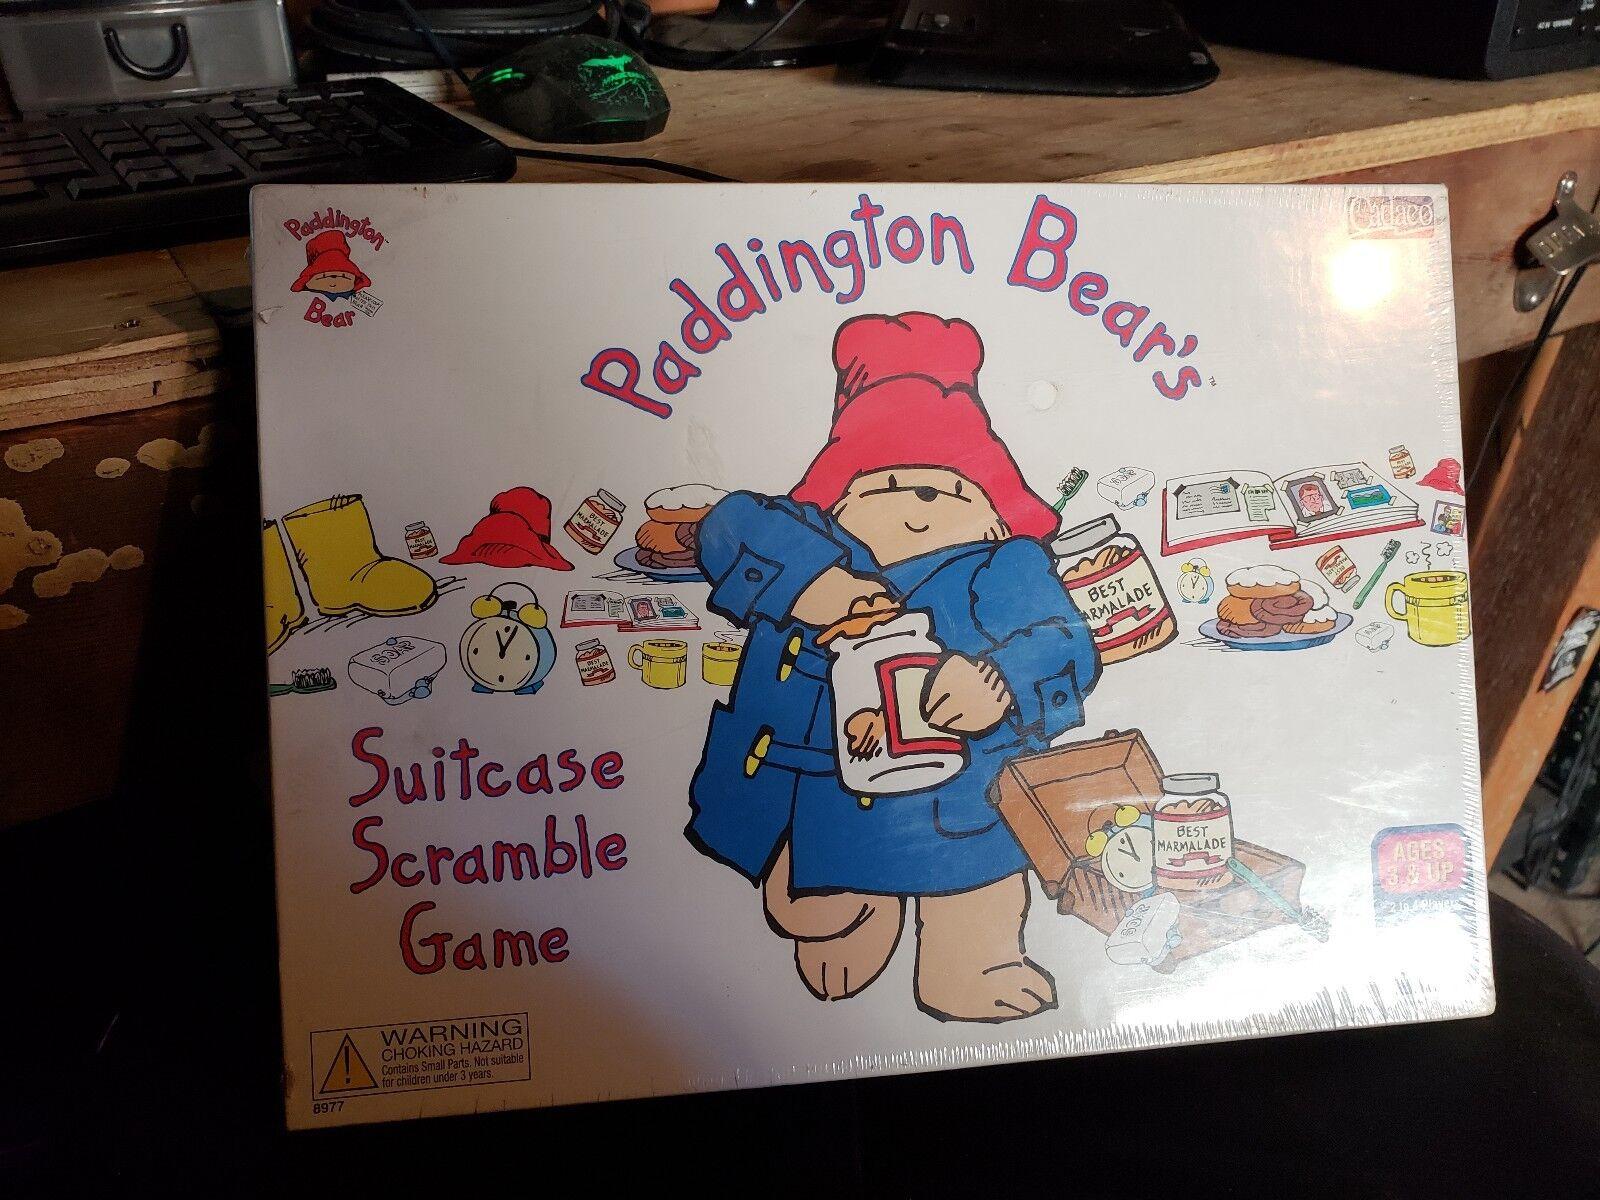 VTG Board Game Complete 1999 Cadaco Paddington Bear's Suitcase Scramble Game